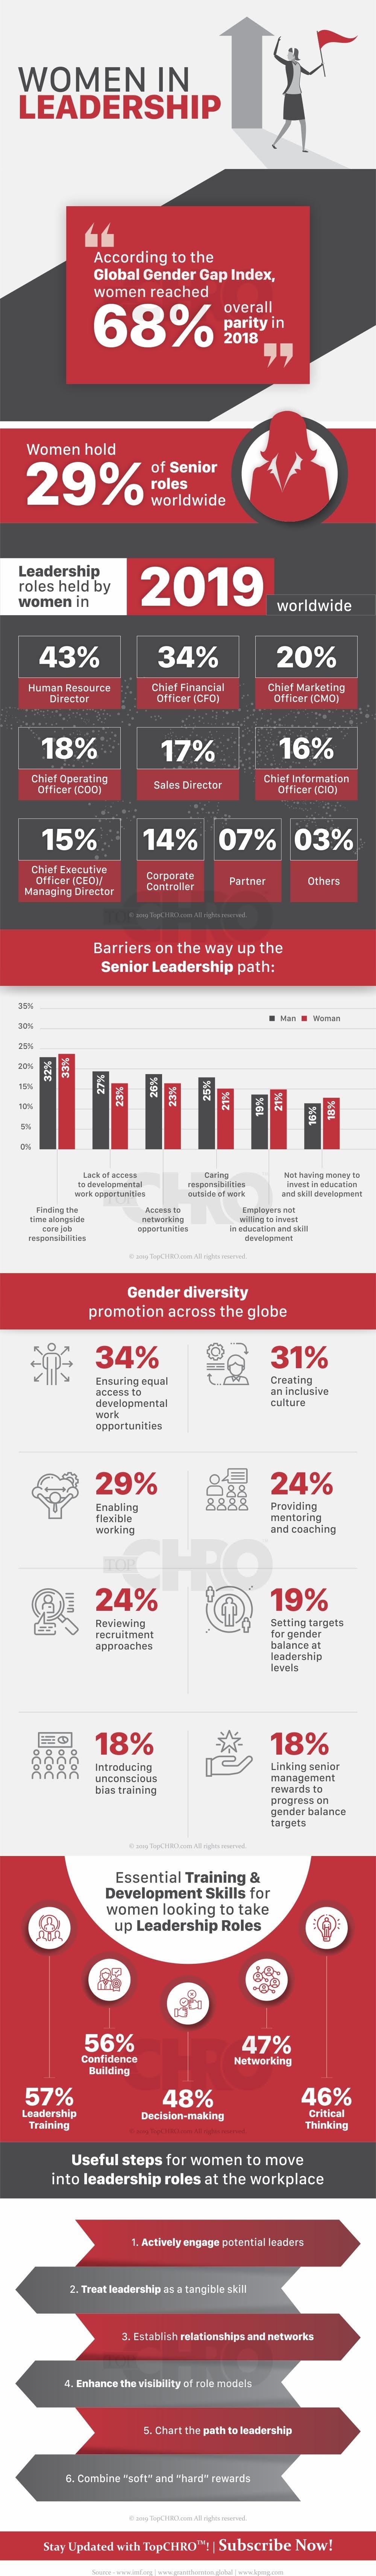 Women in Leadership #infographic